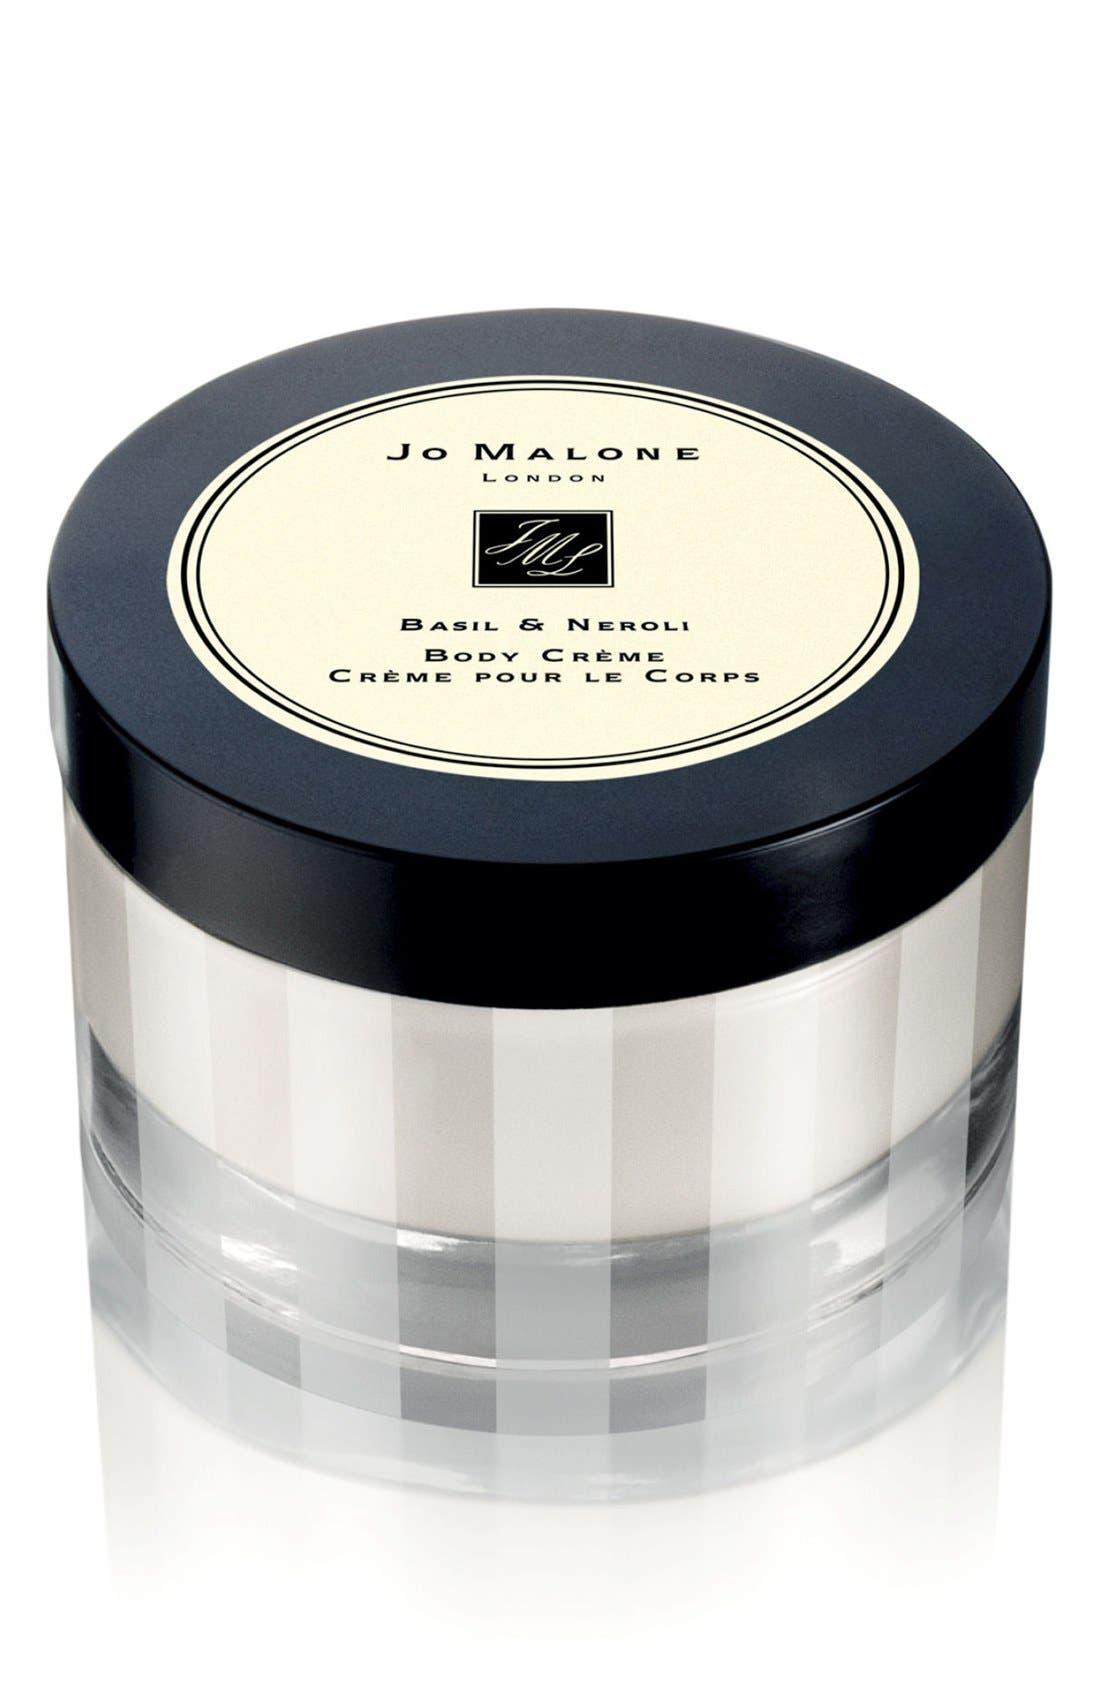 Jo Malone London™ 'Basil & Neroli' Body Crème